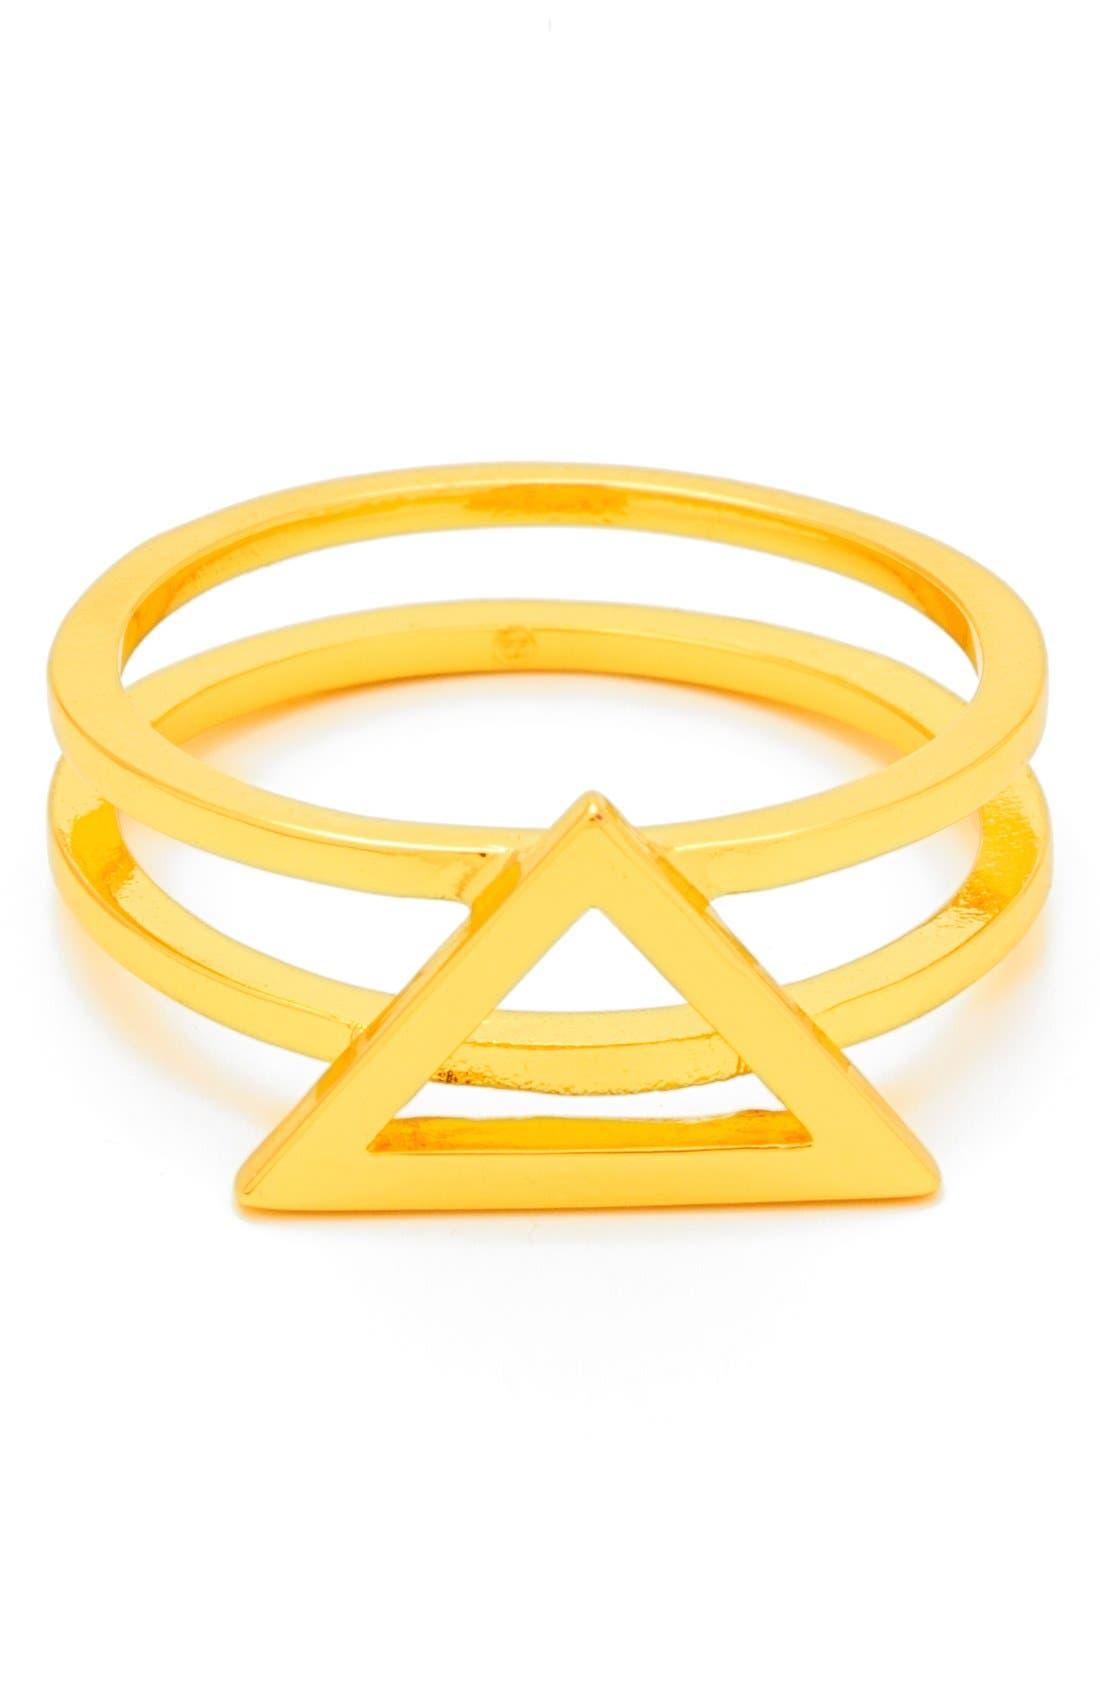 Alternate Image 1 Selected - gorjana 'Anya' Openwork Triangle Ring